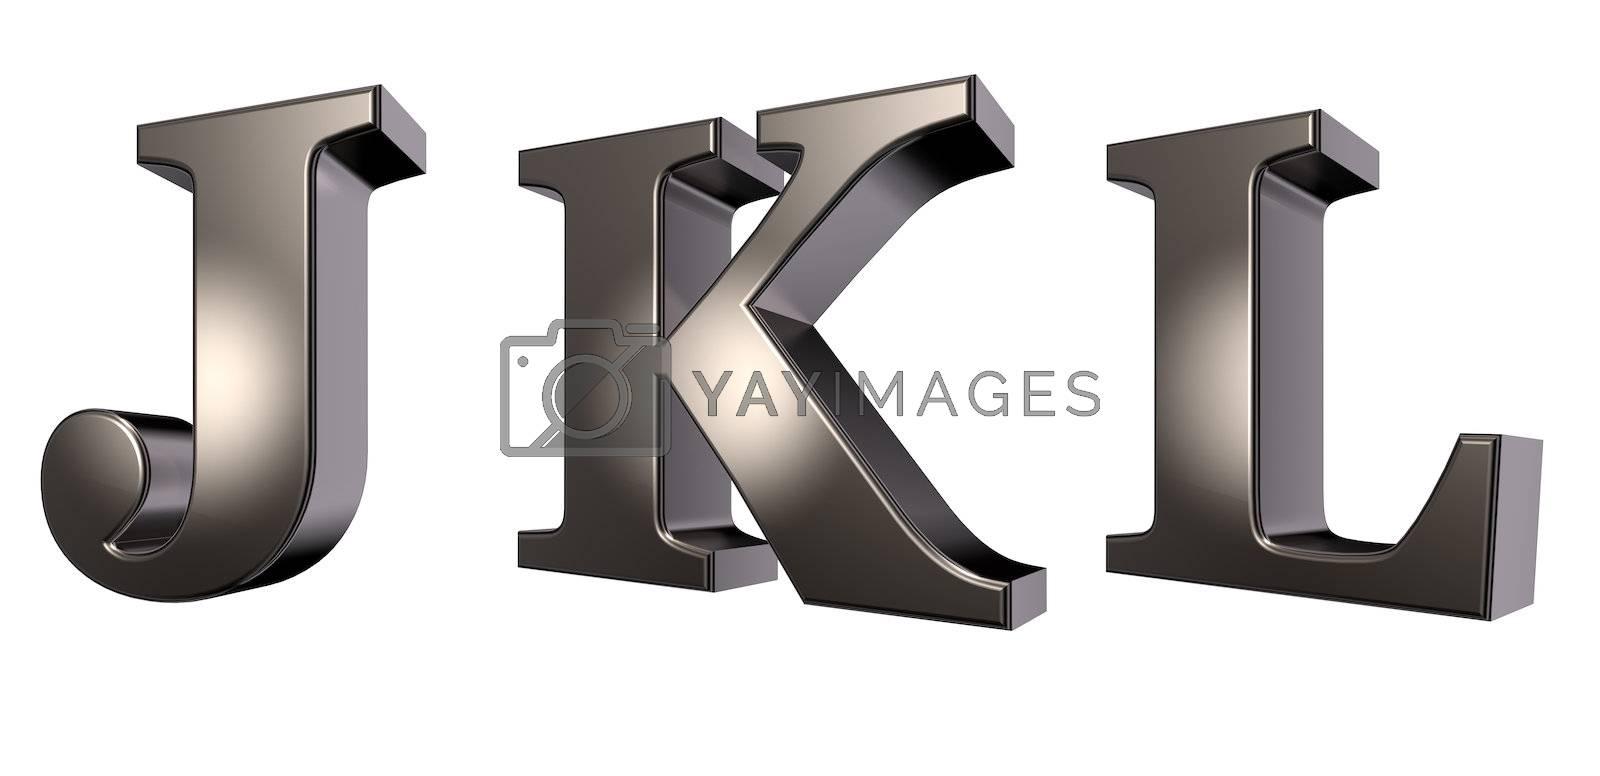 metal  letters j, k and l on white background - 3d illustration